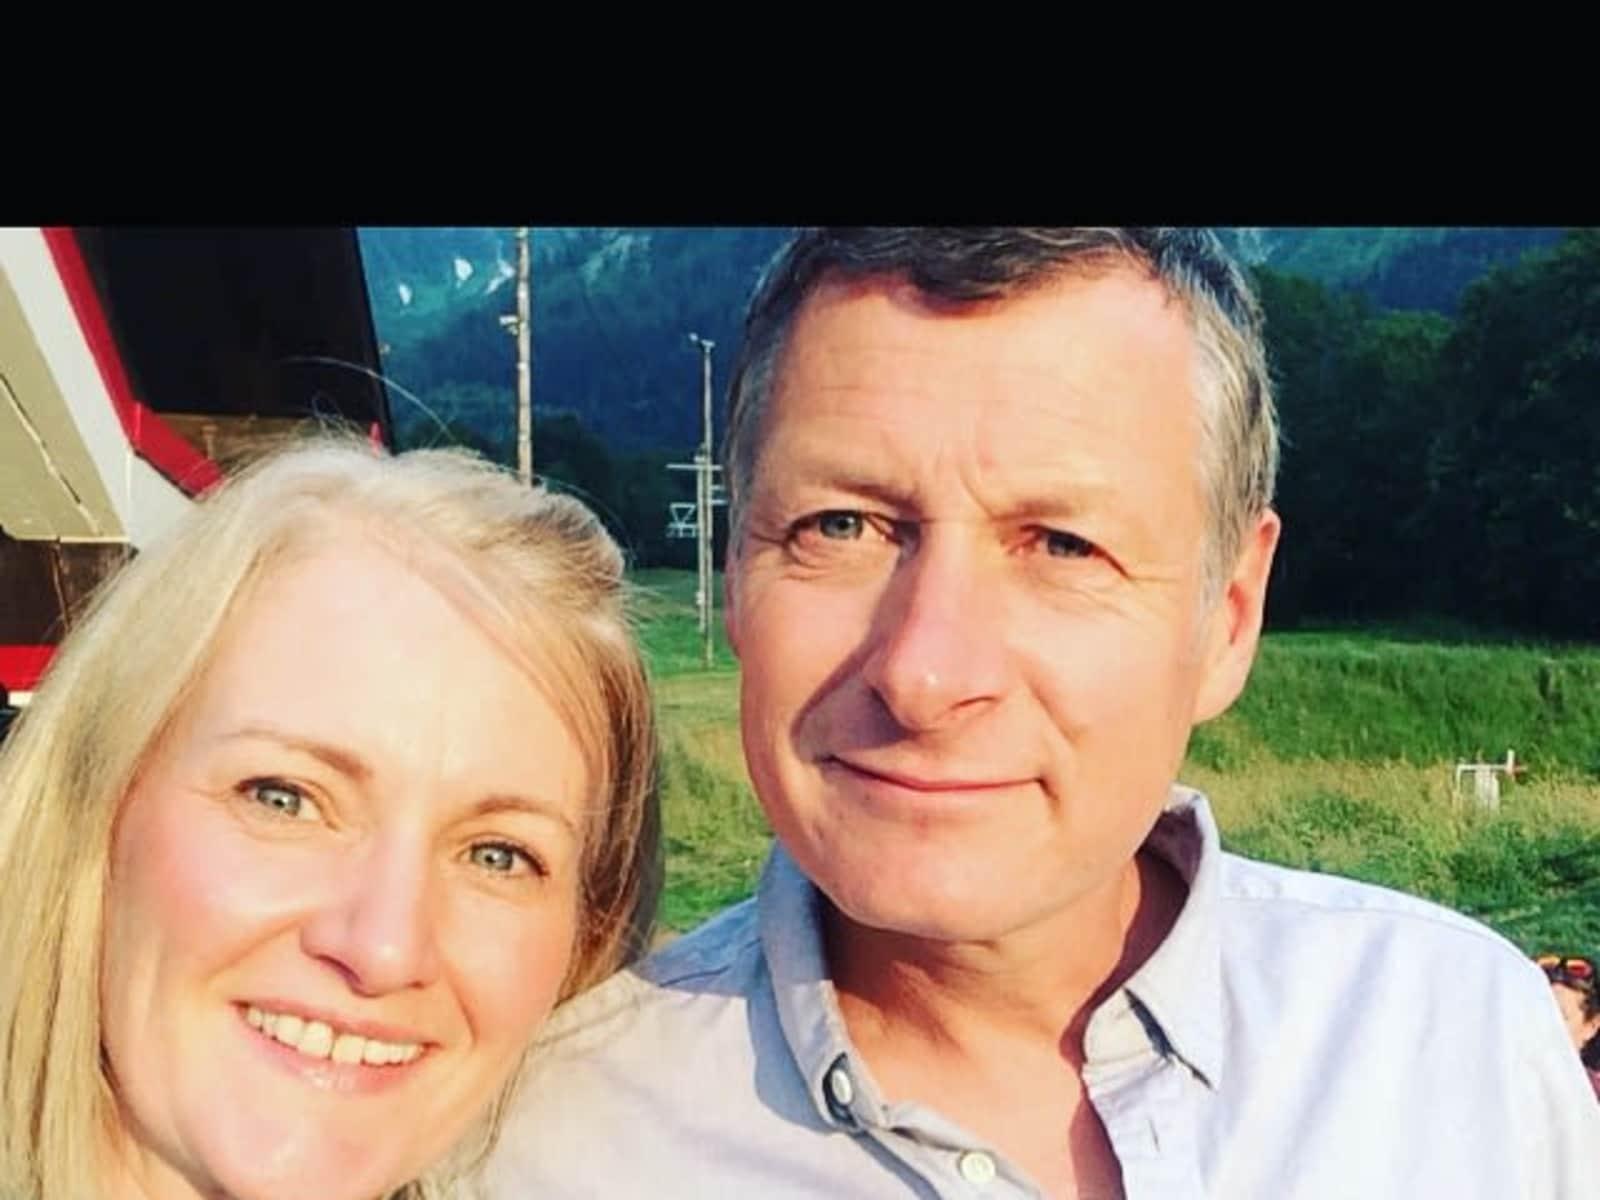 Paul & Emma from Chamonix-Mont-Blanc, France